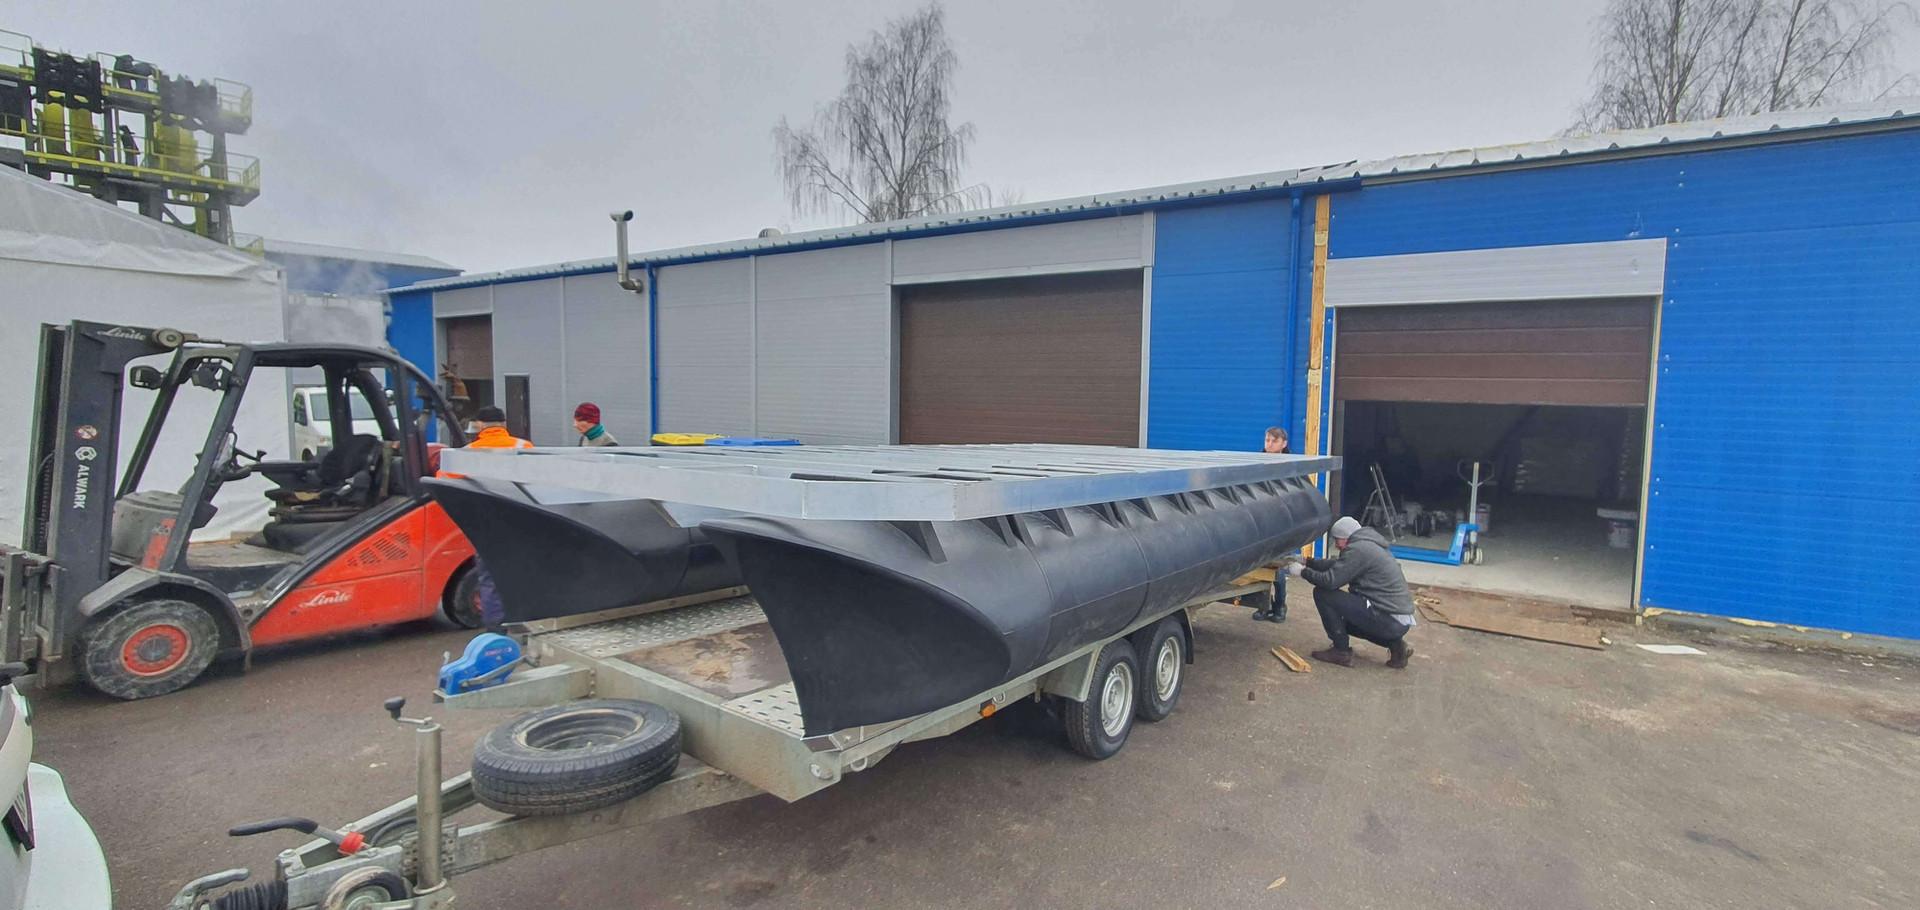 5,8m x 3m catamaran soon to be shipped